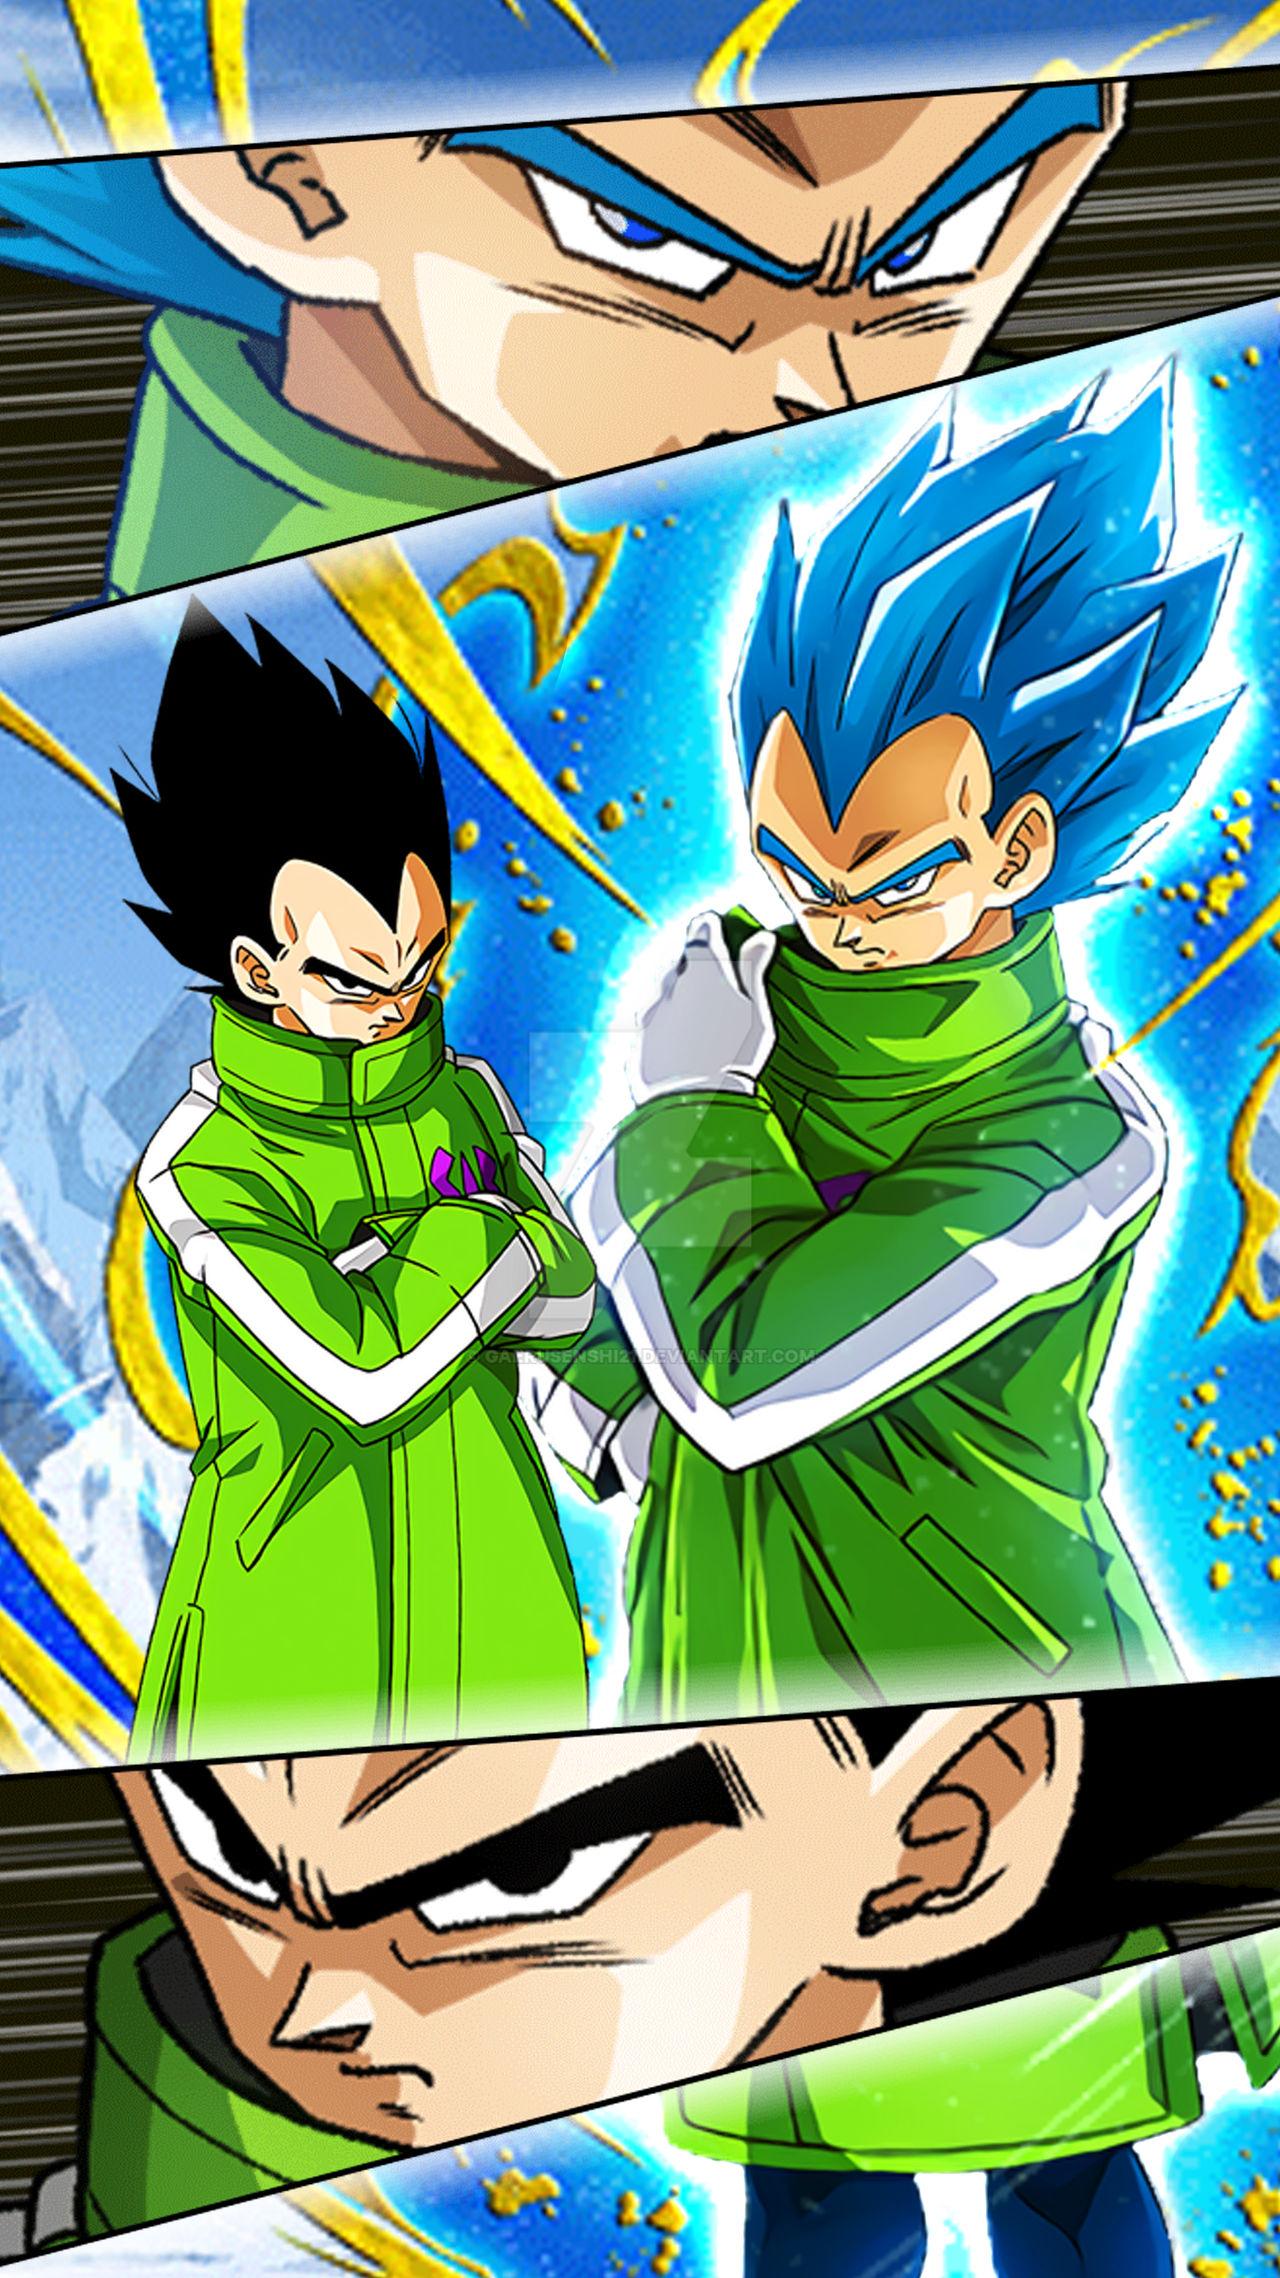 Wallpaper Vegeta Dragon Ball Z Dokkan Battle 6 By Gaerusenshi21